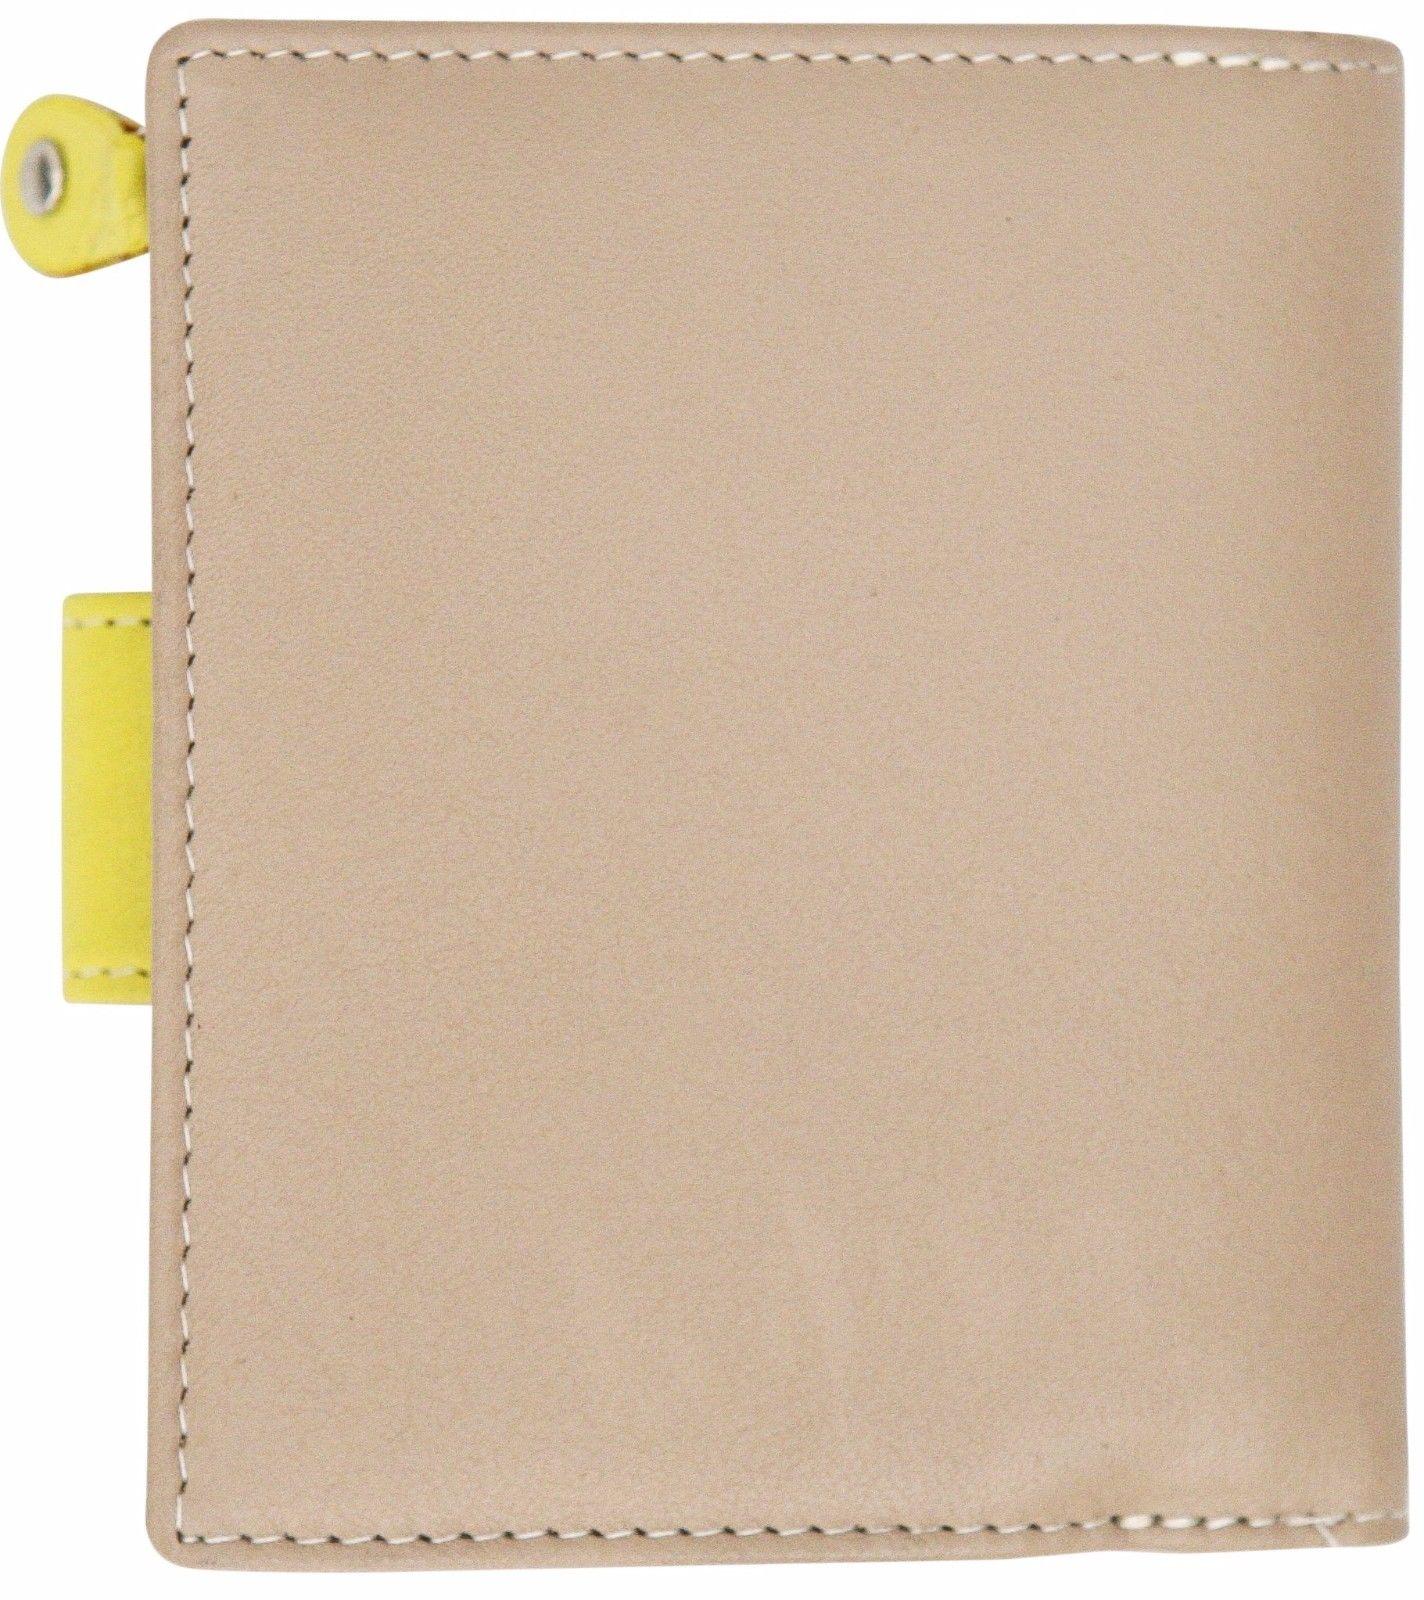 Felda-RFID-onorevoli-MEDAGLIA-amp-Card-Purse-Wallet-Genuine-Leather-Multi-SOFT-BOX-REGALO miniatura 65